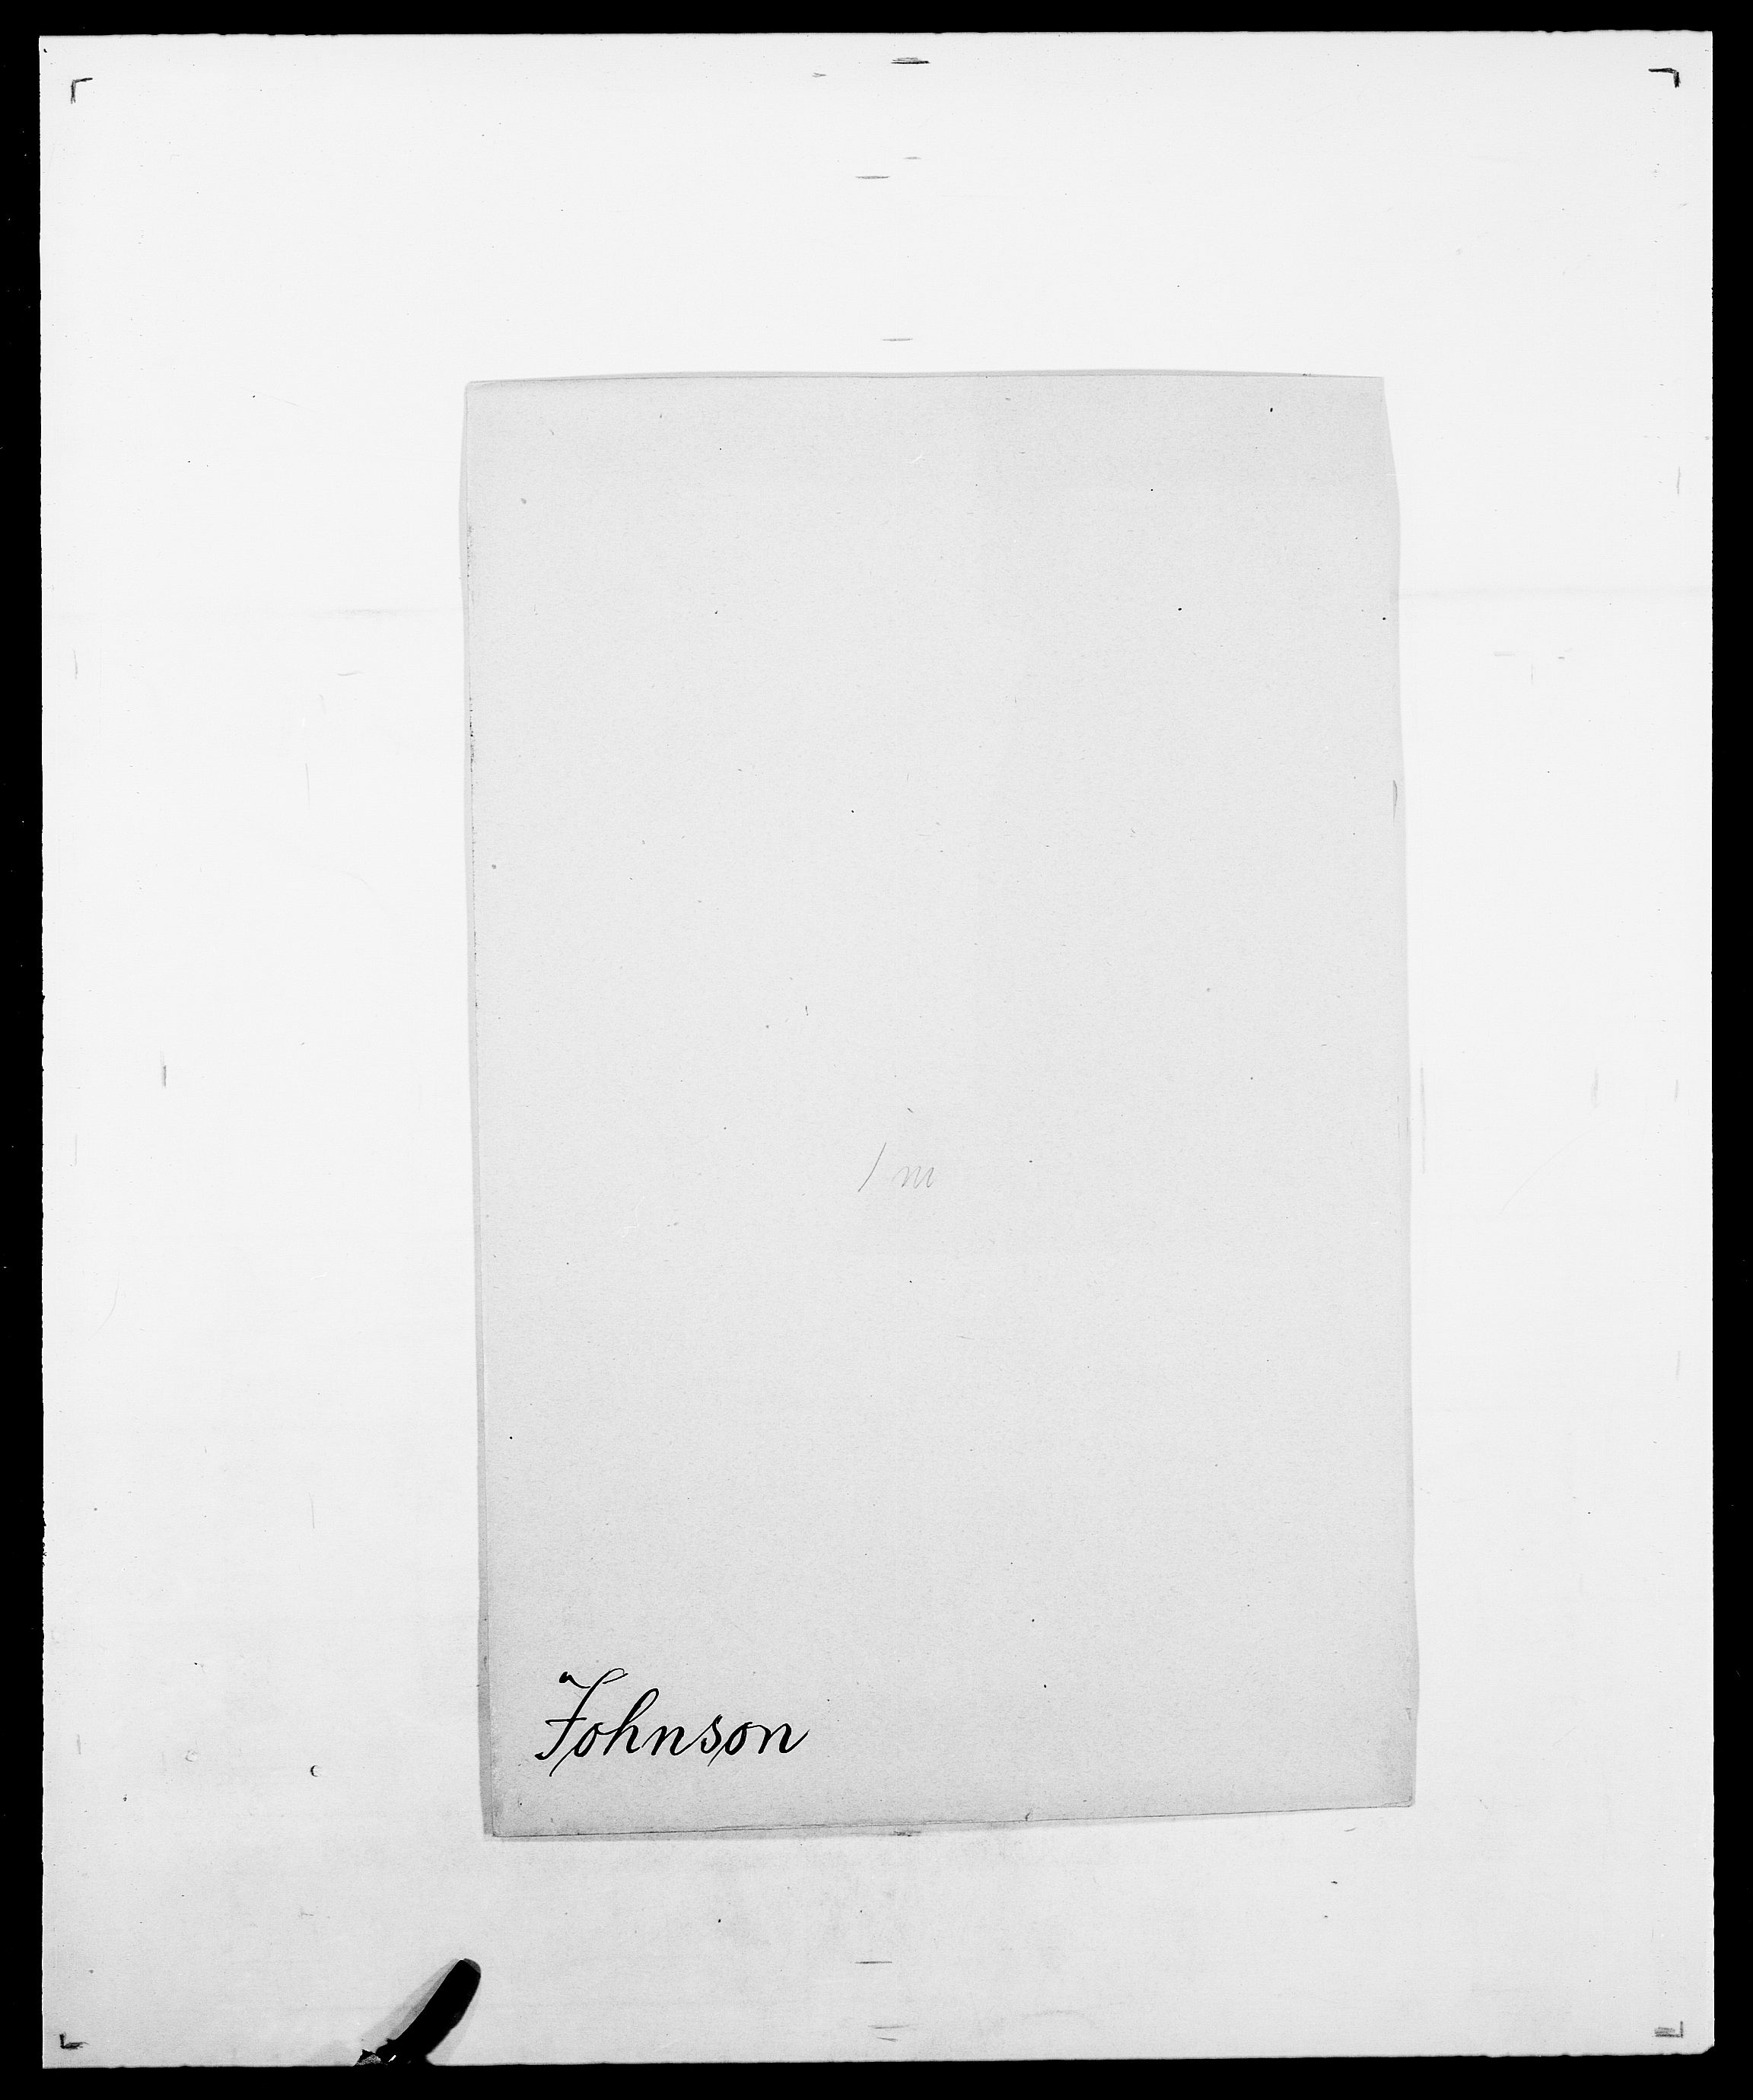 SAO, Delgobe, Charles Antoine - samling, D/Da/L0019: van der Hude - Joys, s. 869